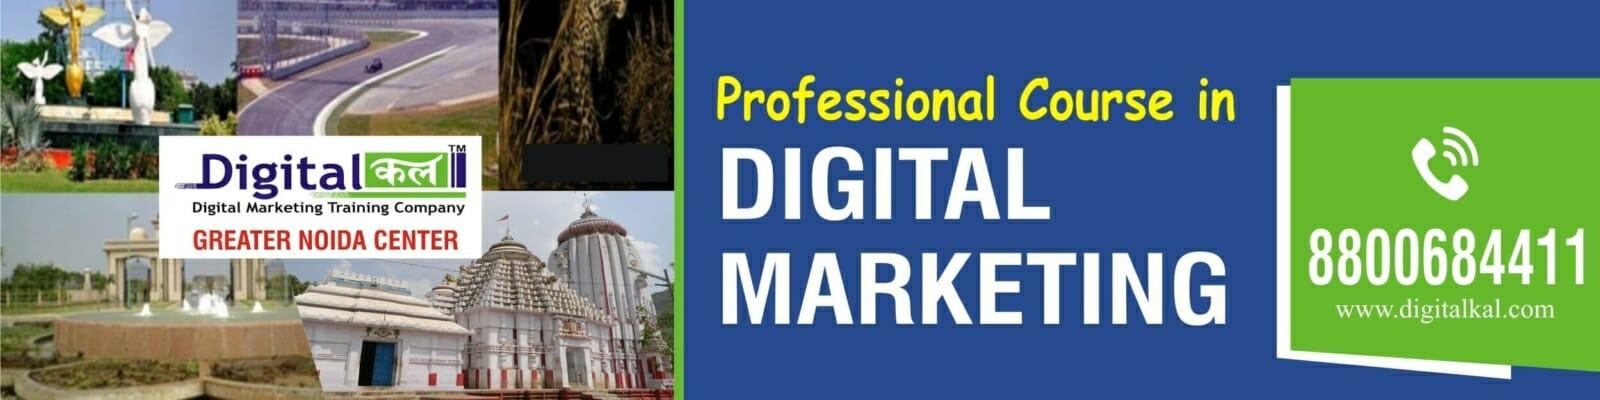 Best Digital Marketing Training Institute in Greater Noida